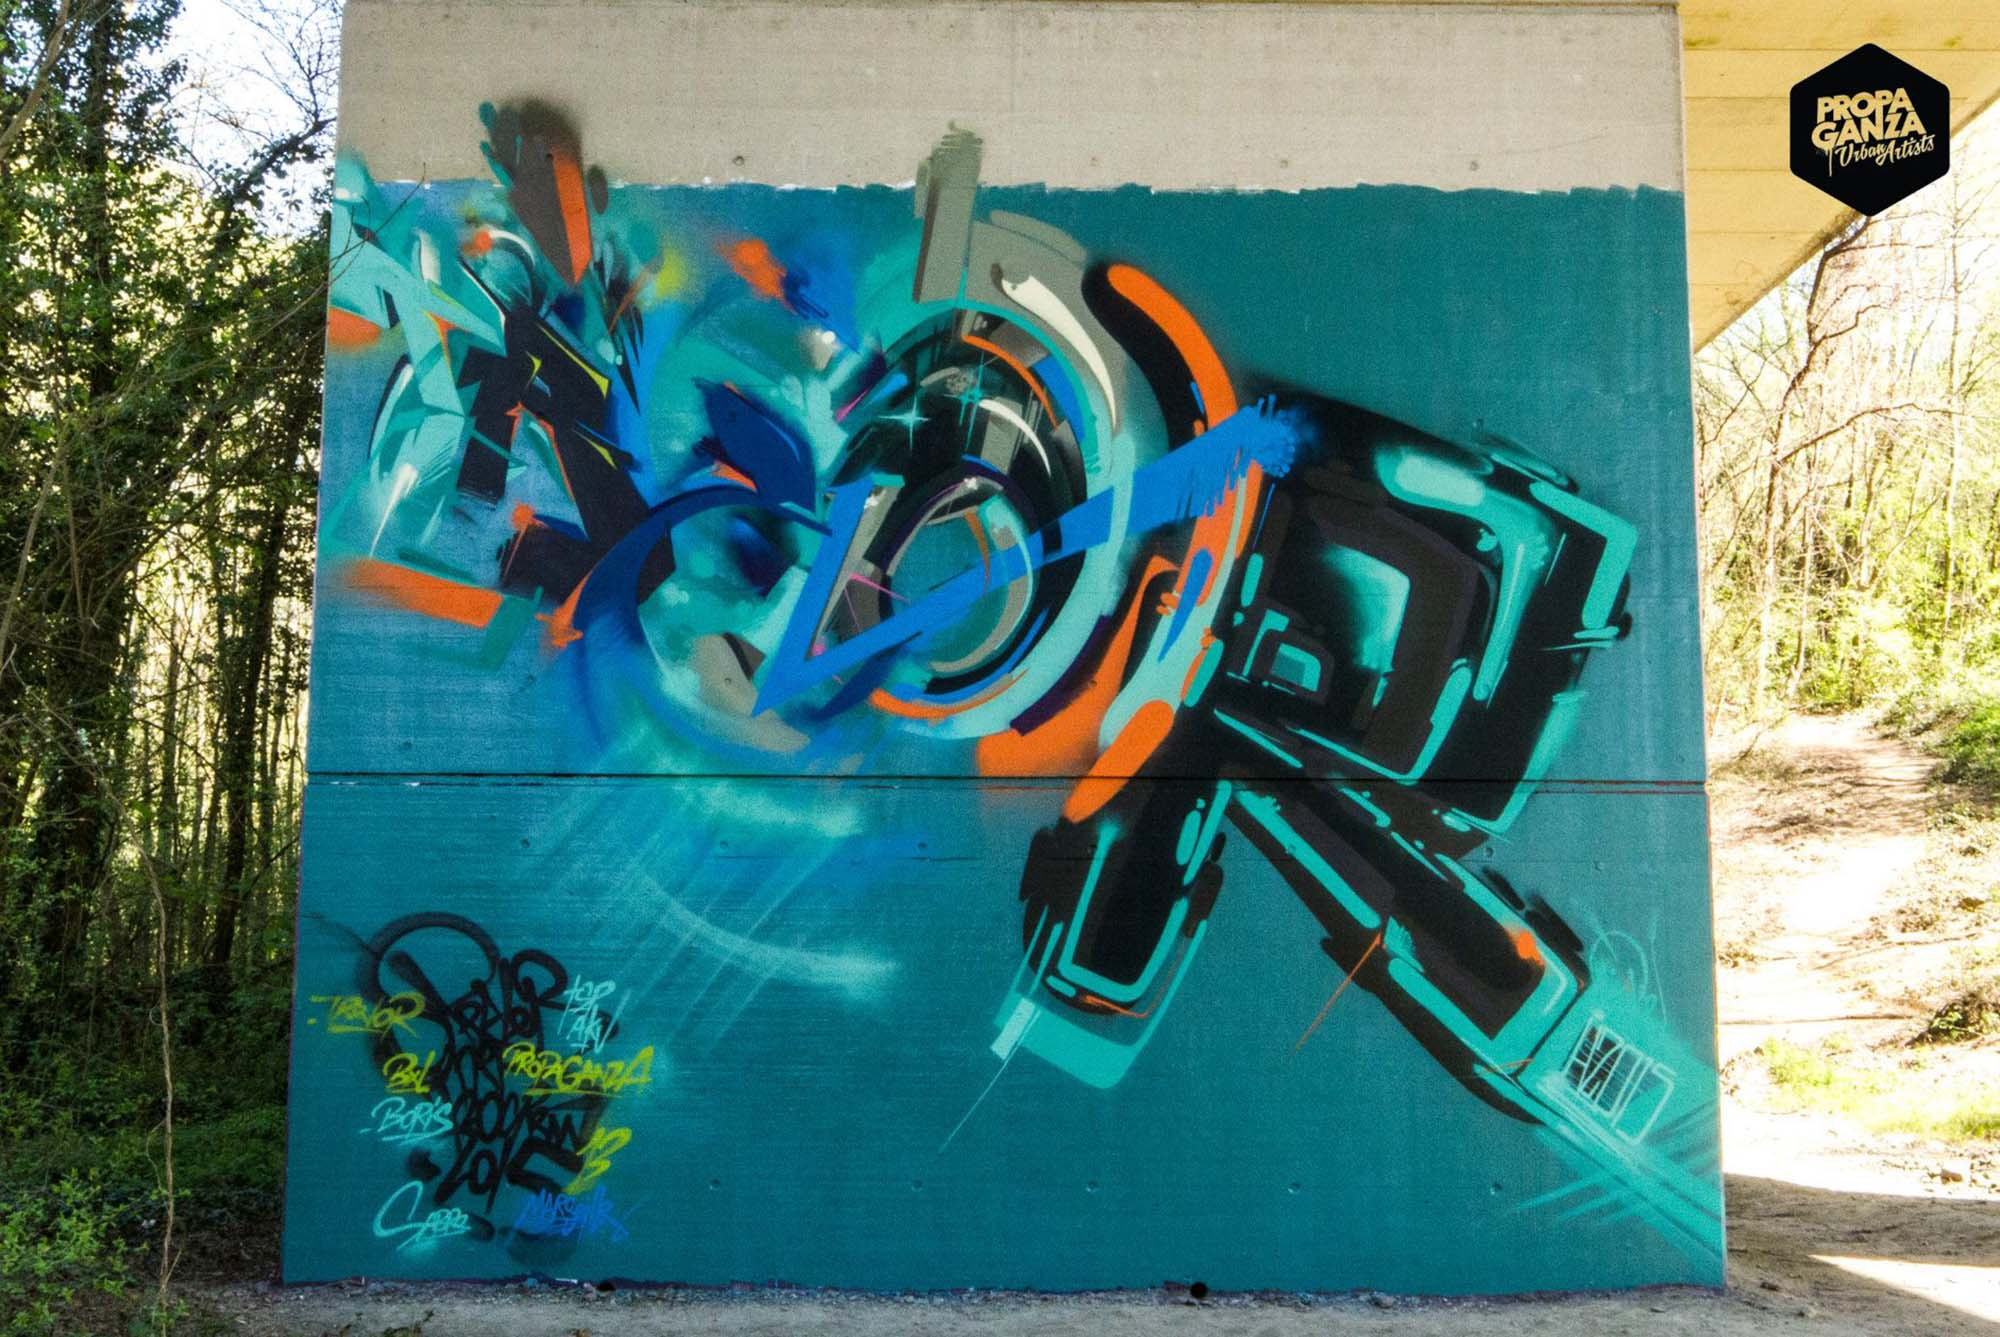 https://www.propaganza.be/wp-content/uploads/2019/04/Real-propaganza-urban-artist-graffiti-graff-street-art-spray-painting-belgique-1.jpg